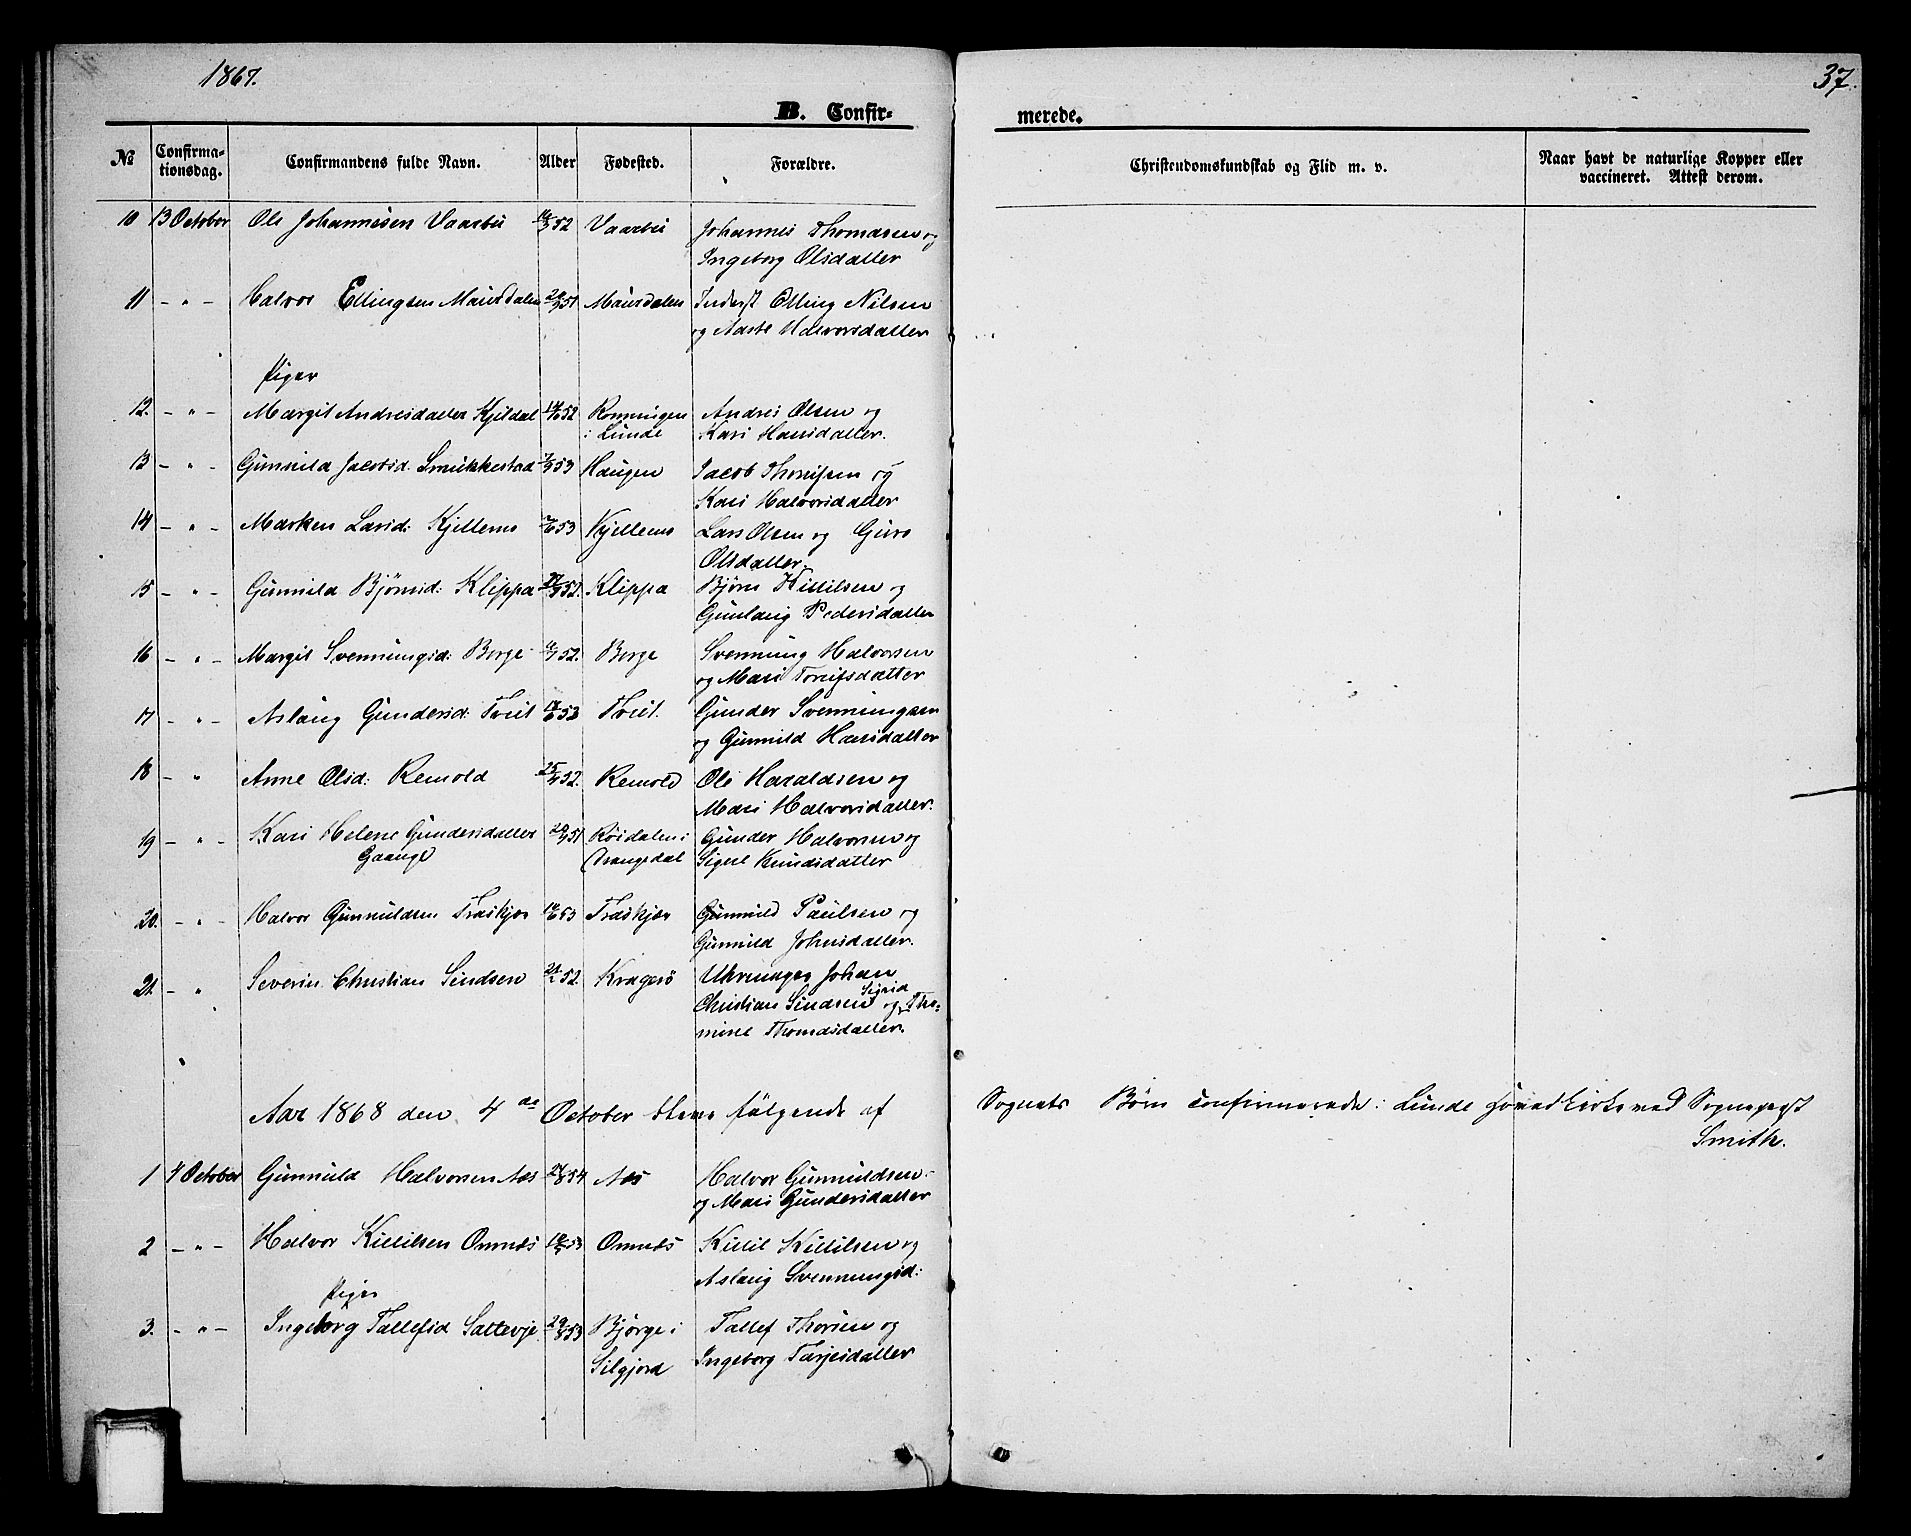 SAKO, Lunde kirkebøker, G/Gb/L0001: Klokkerbok nr. II 1, 1866-1887, s. 37